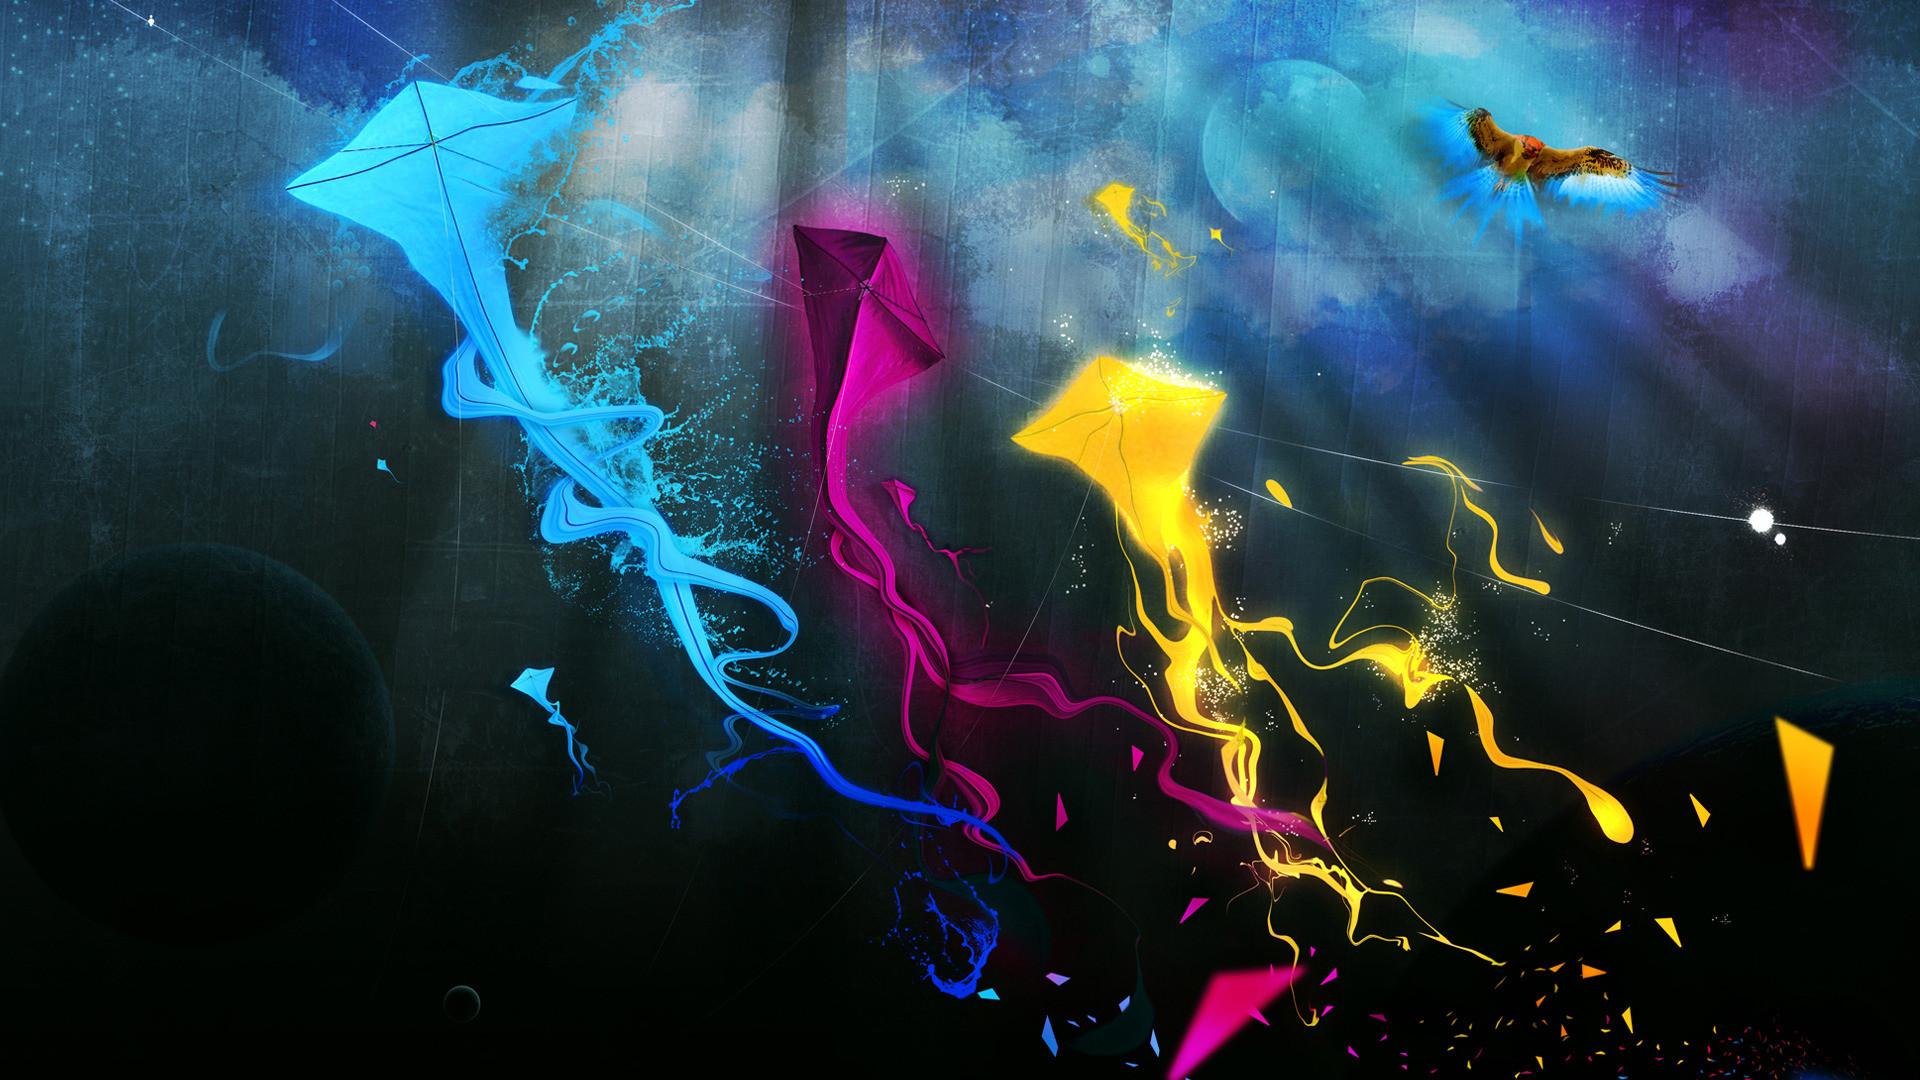 1920x1200 Top HD Cool Desktop Backgrounds Wallpaper